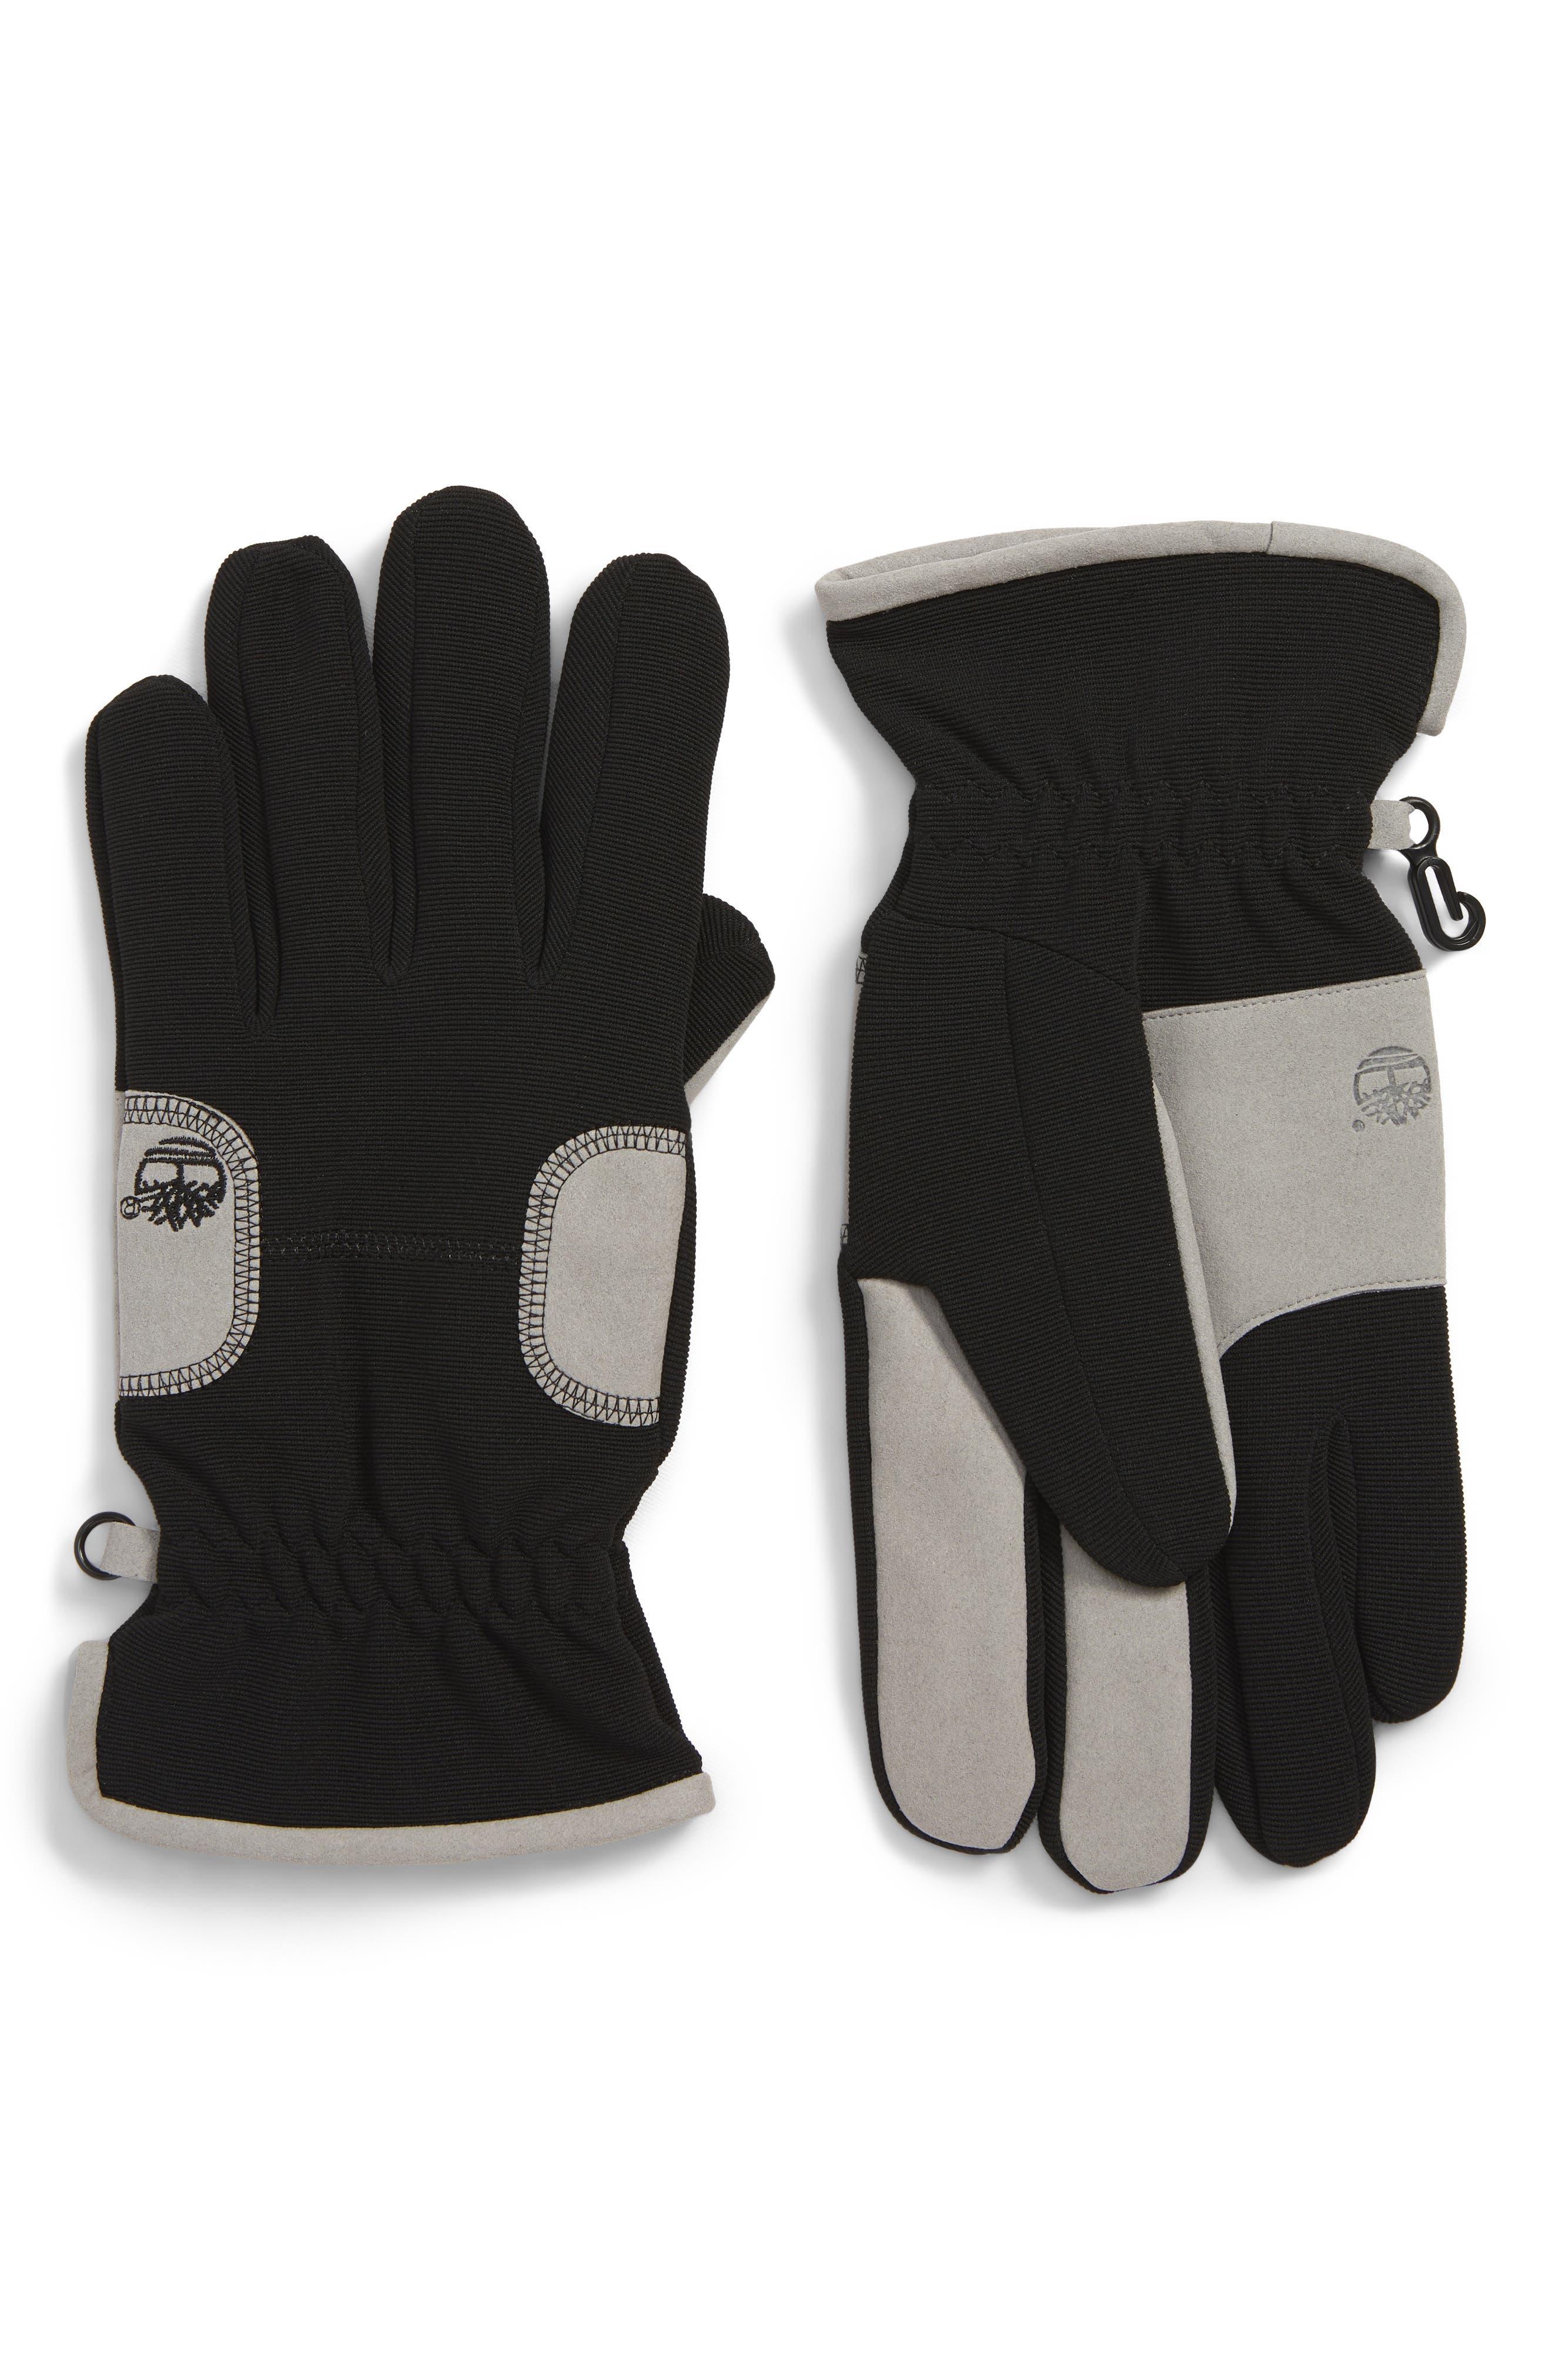 Timberland Urban Cowboy Gloves, Black